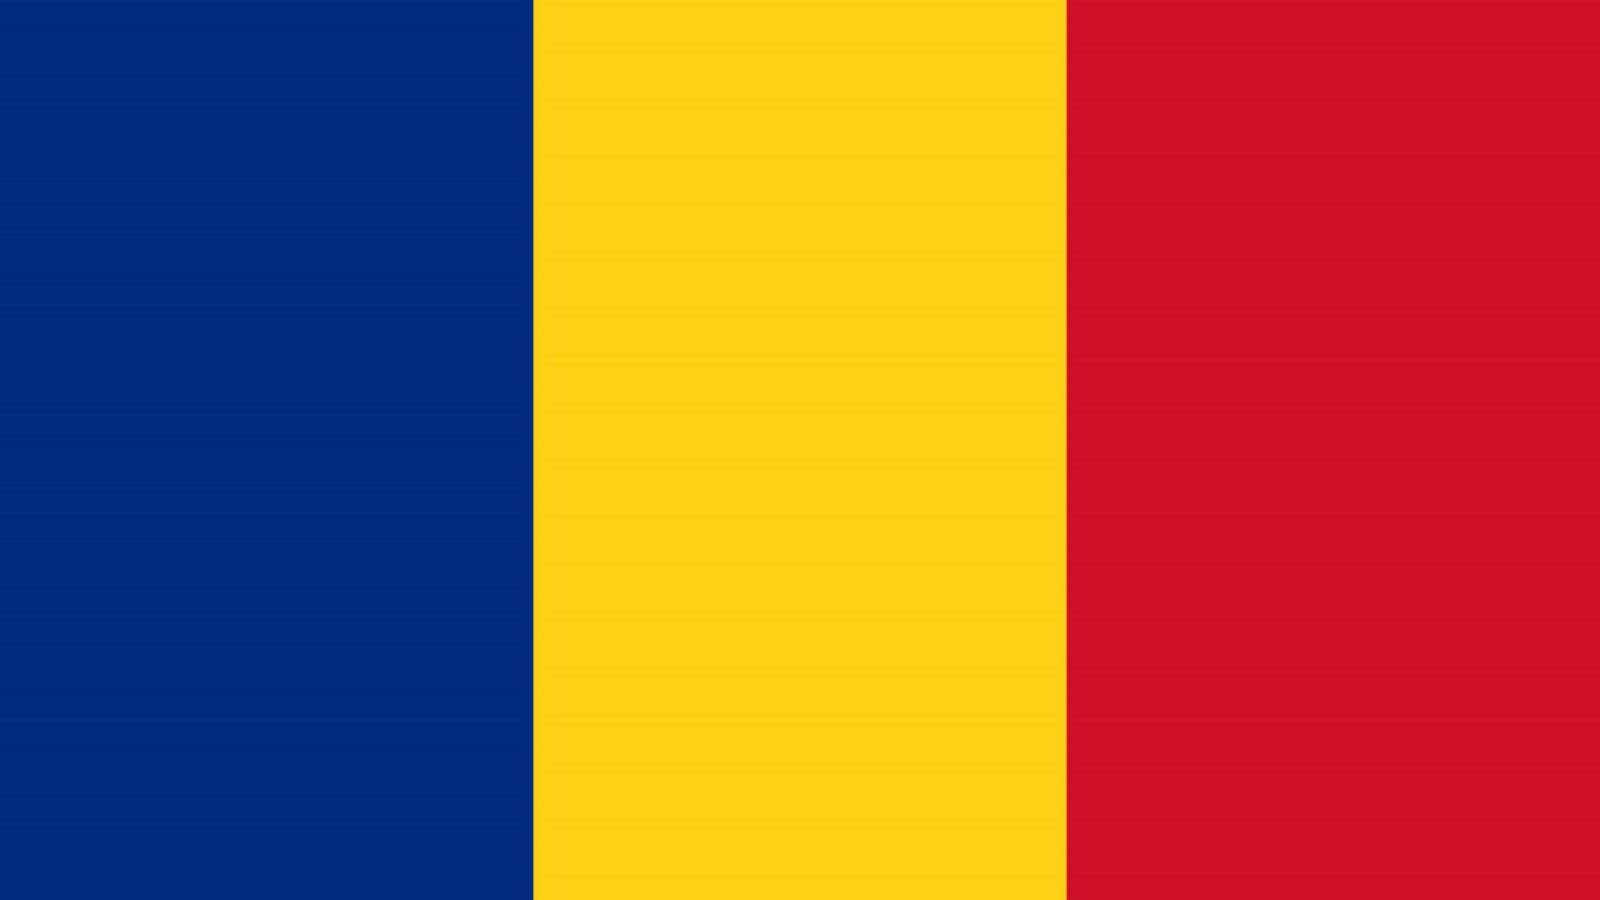 Coronavirus MII Persoane Vaccinate Romania 24 ore